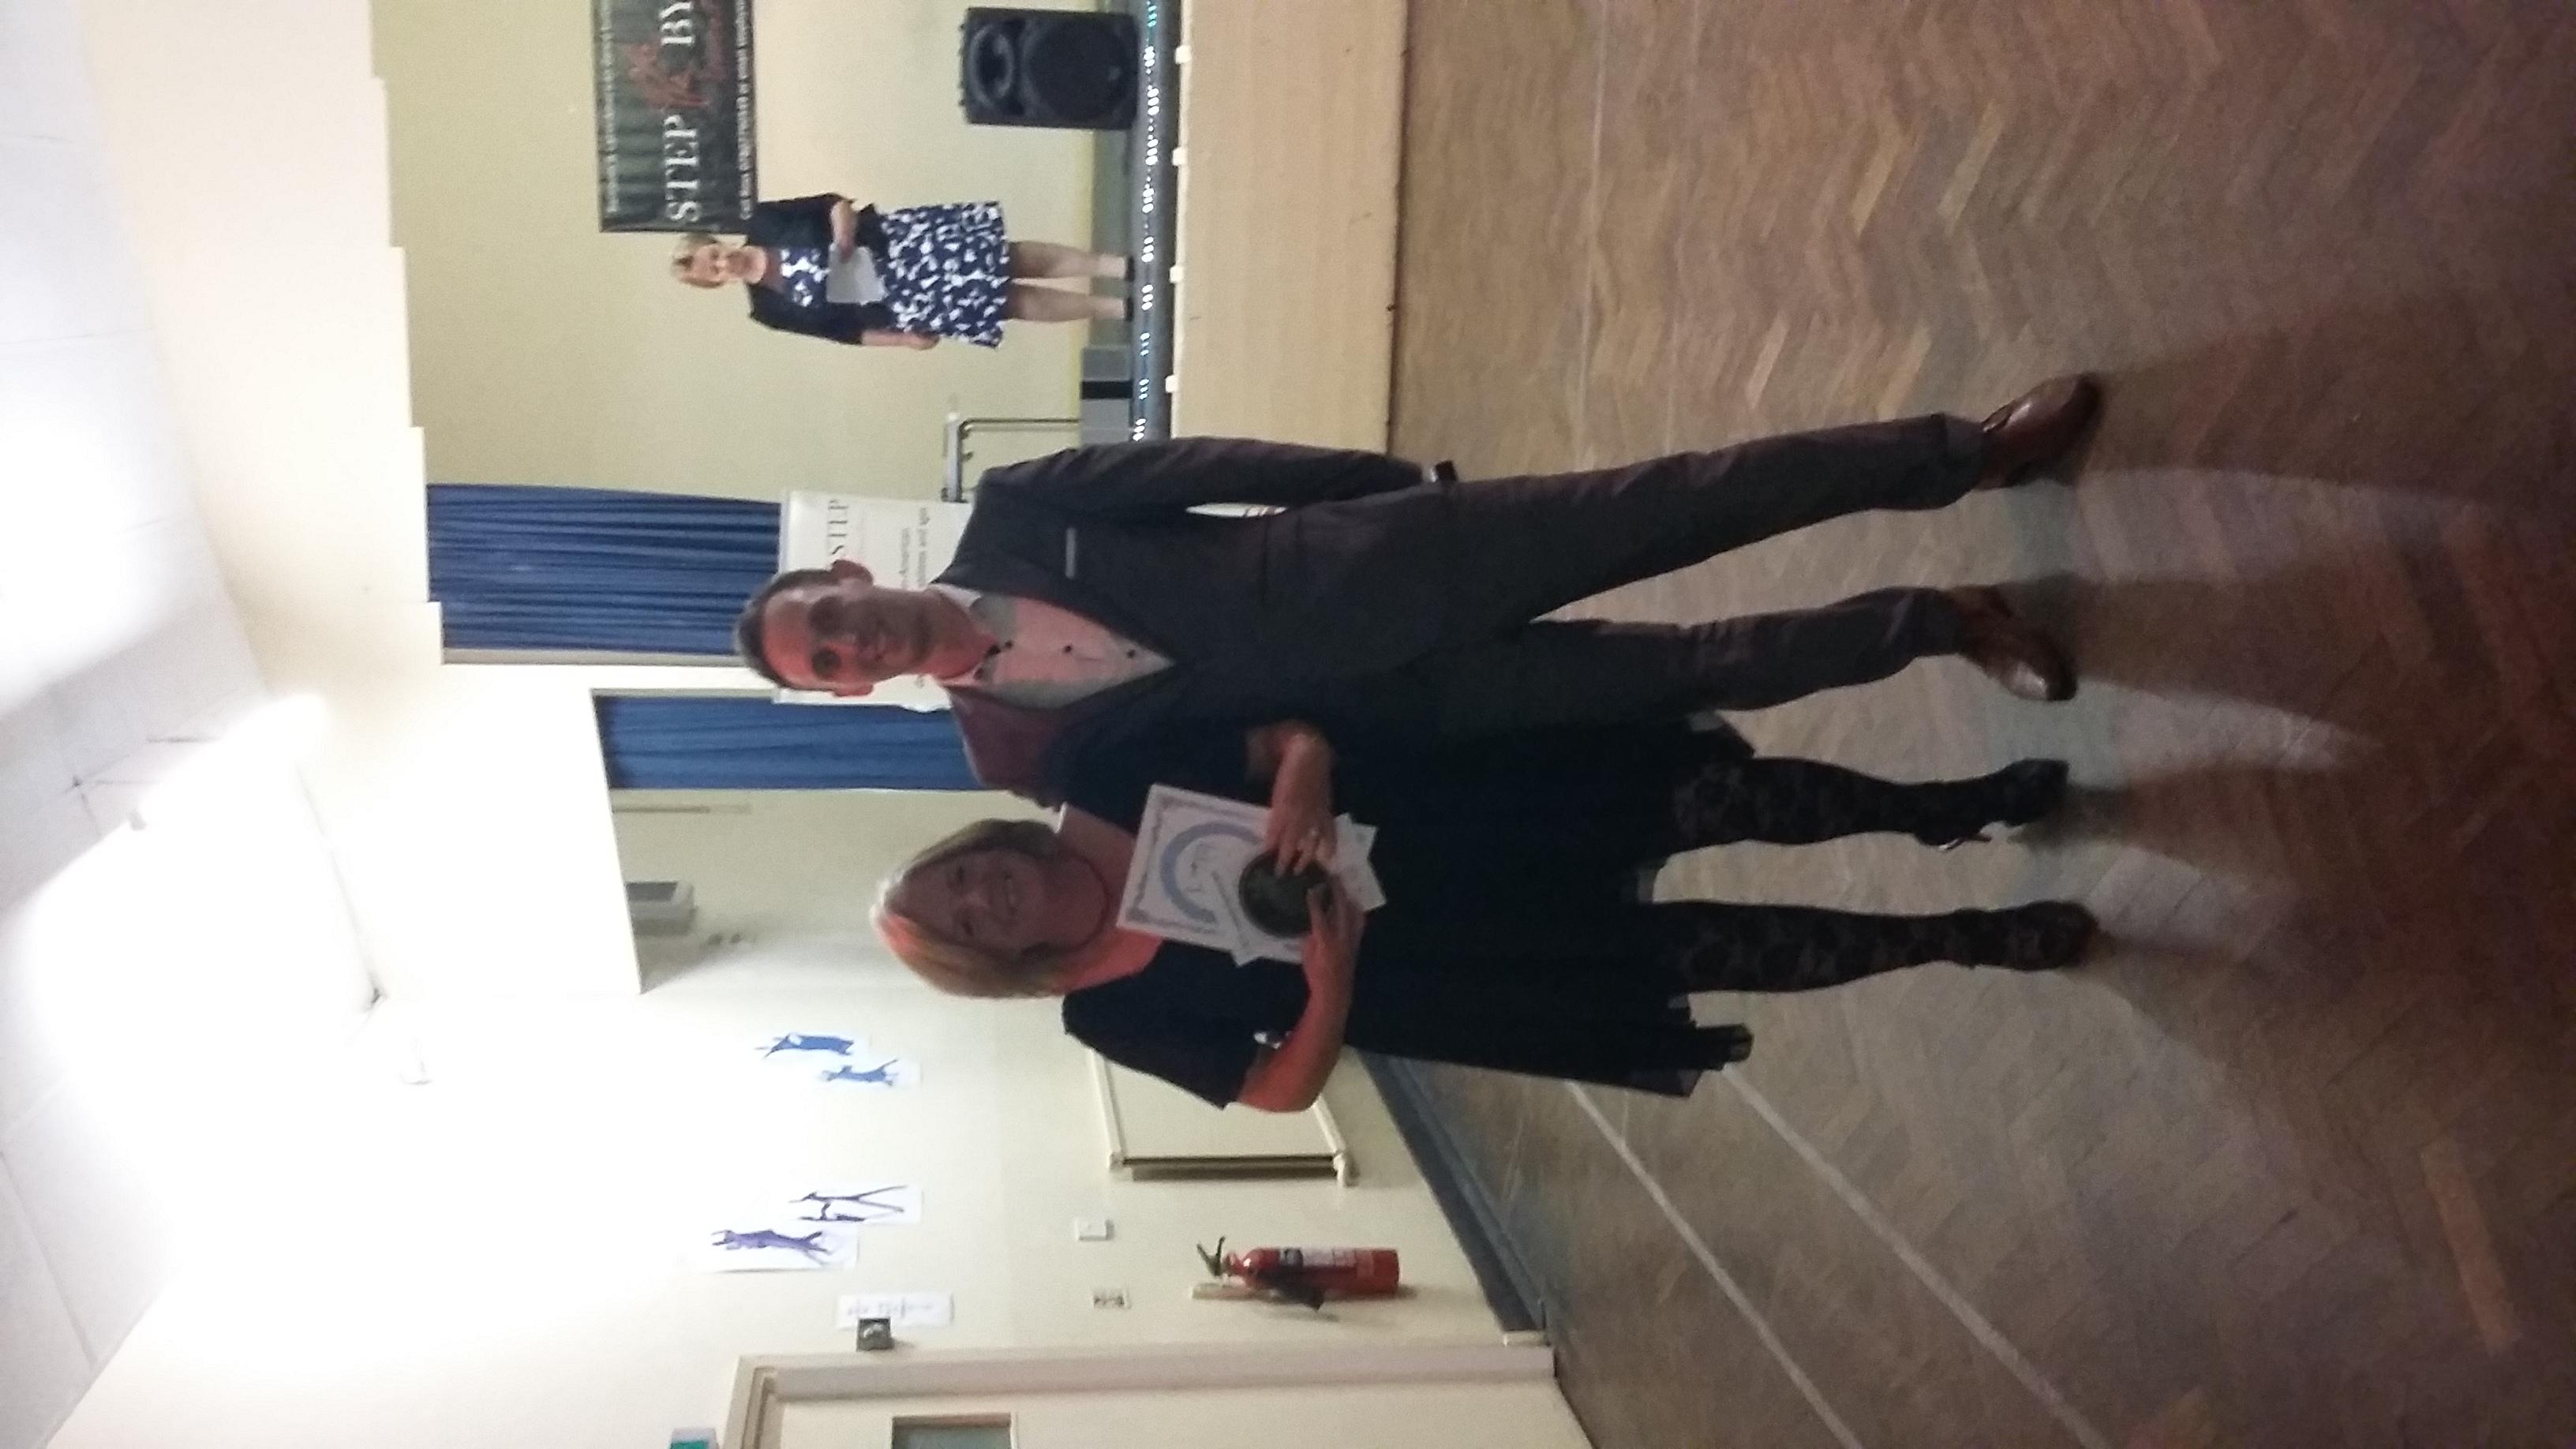 Angela receiving her Intro 6 award